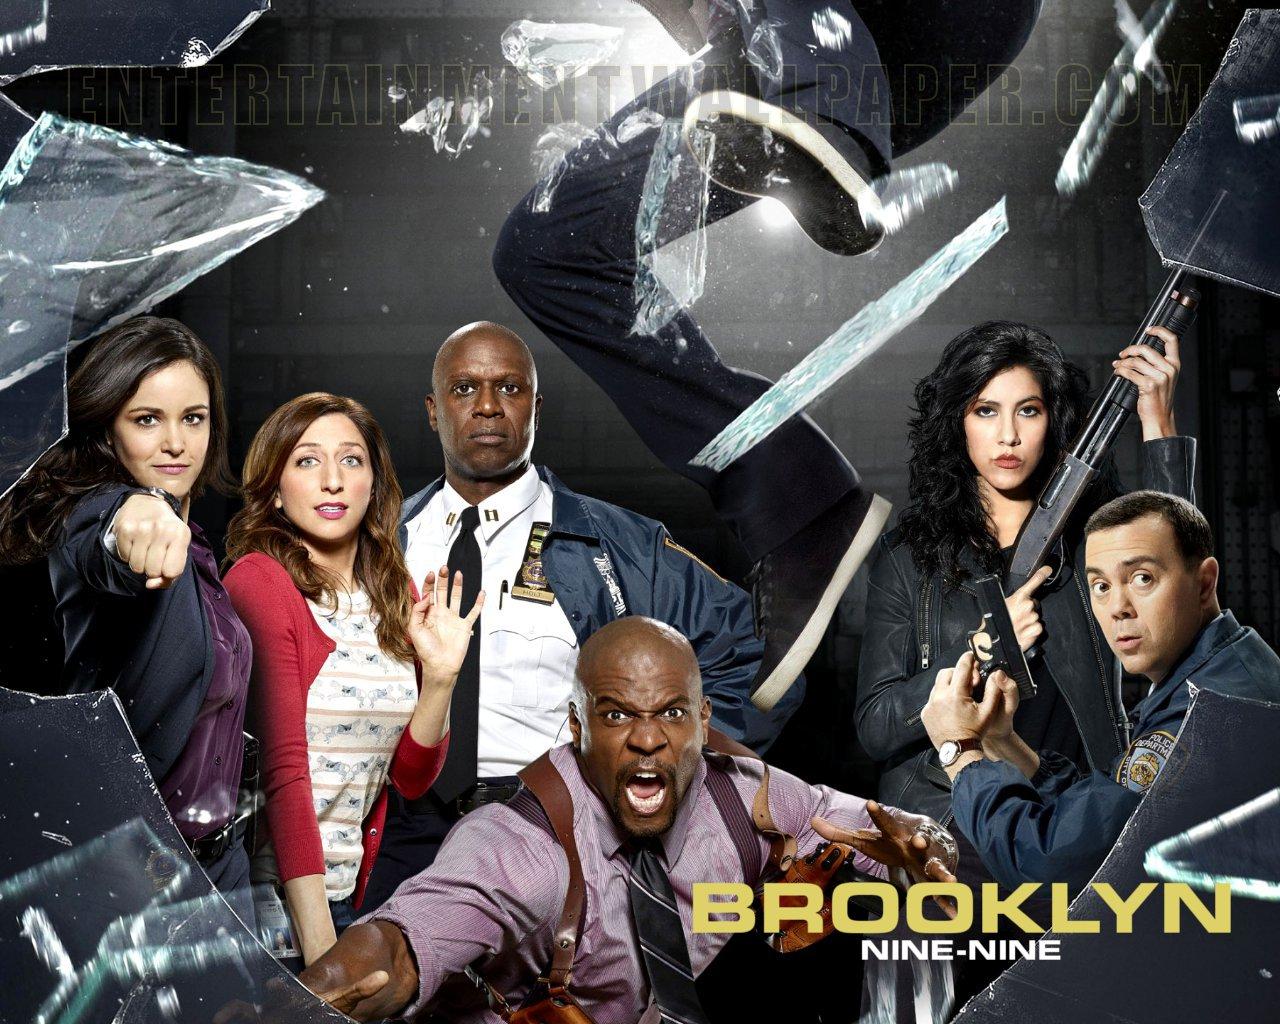 Brooklyn Nine Nine Wallpaper   20044744 1280x1024 Desktop 1280x1024